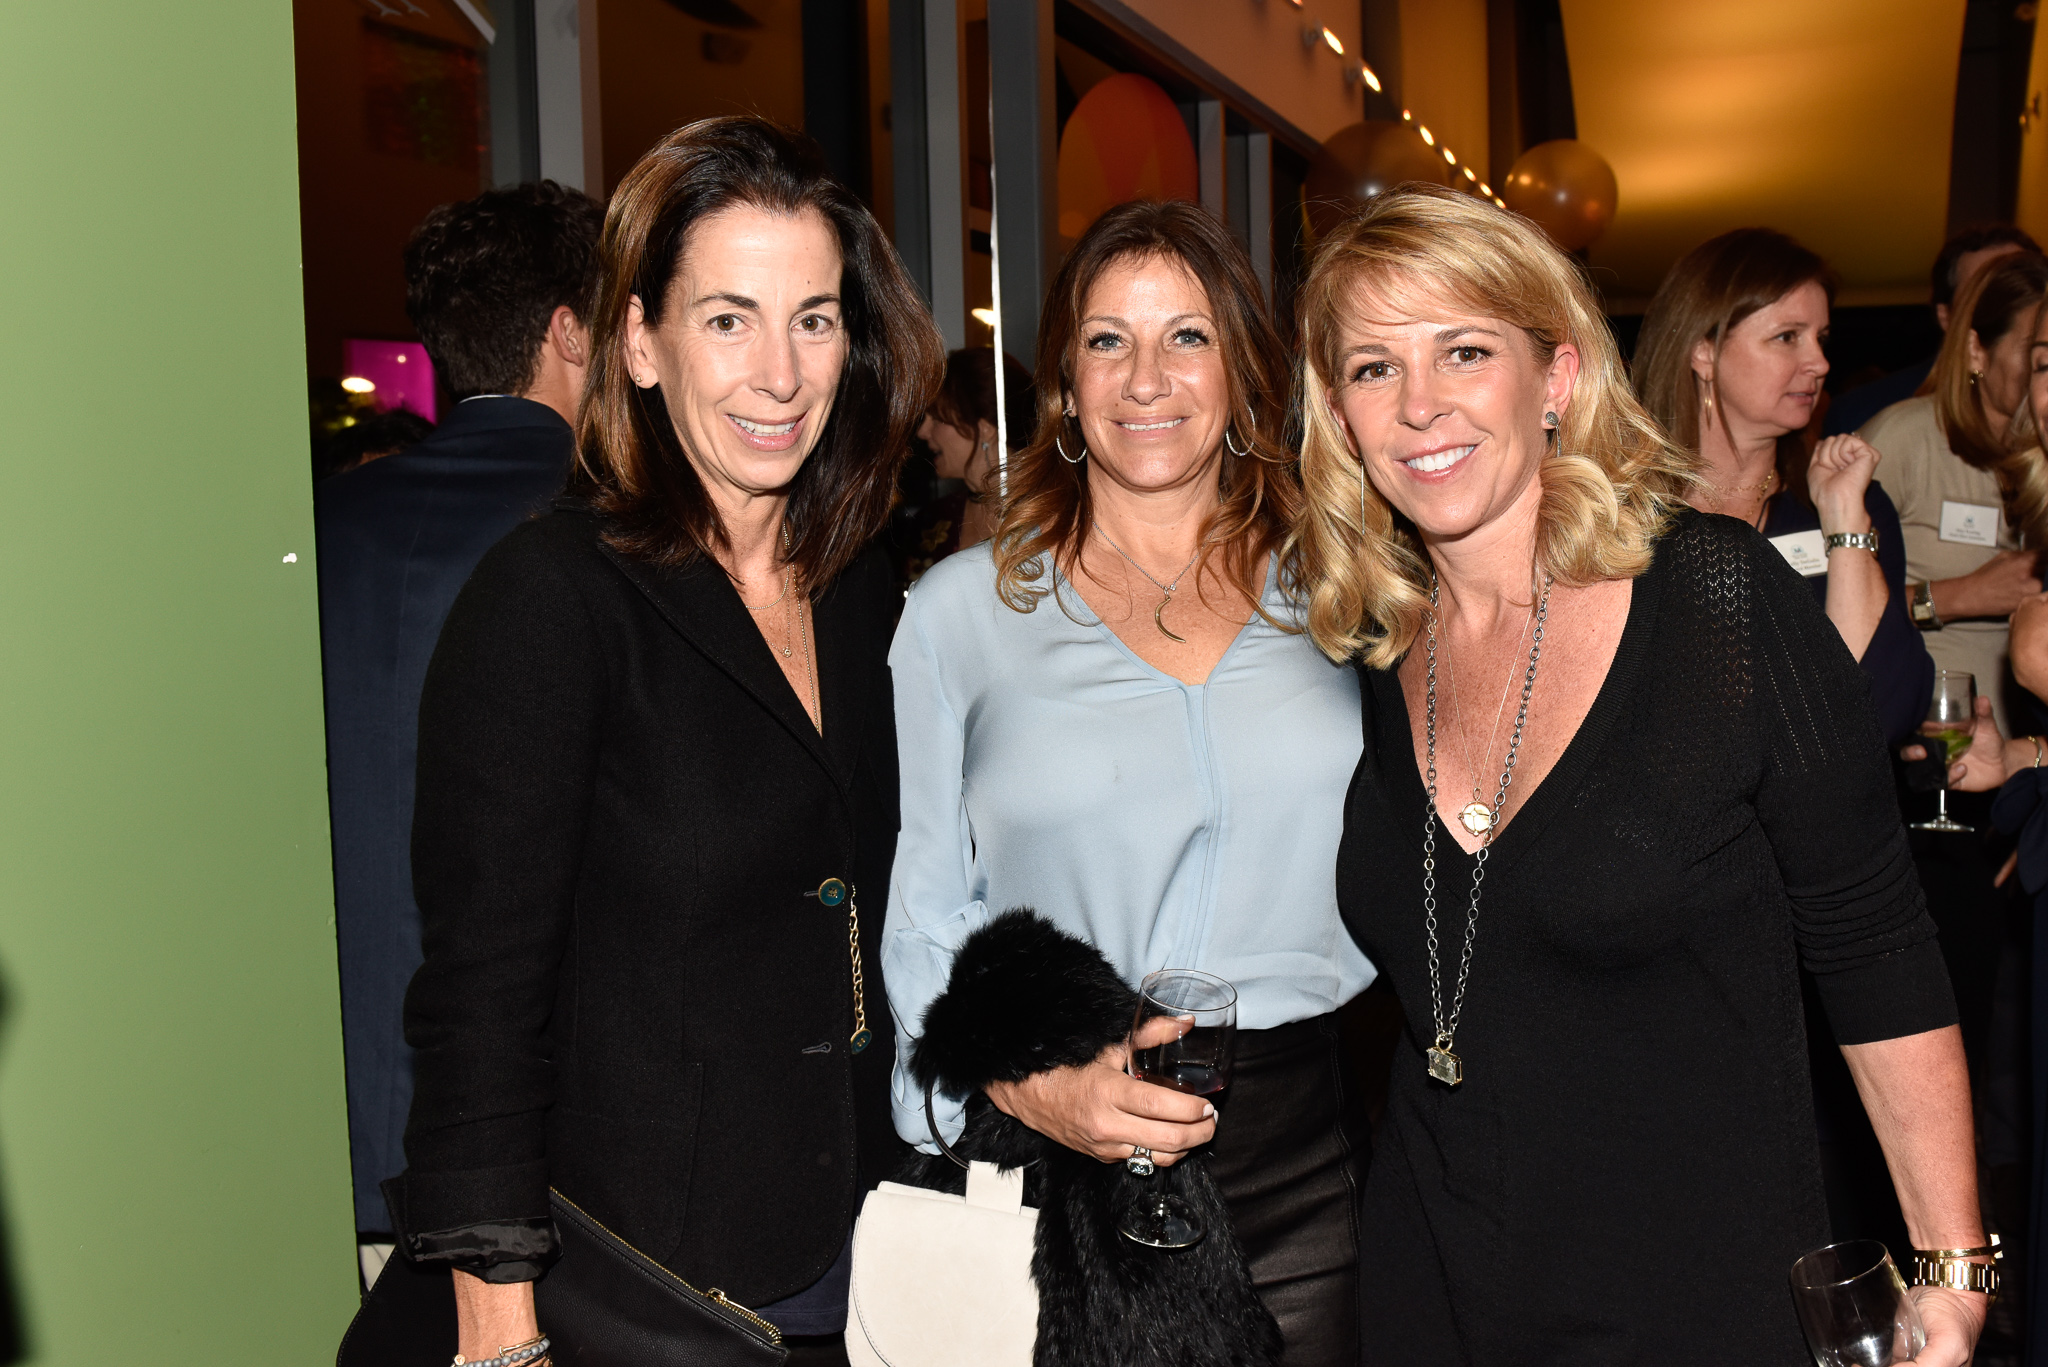 Claire O'Hare, Gina Dunn, Liz Ann Sonders